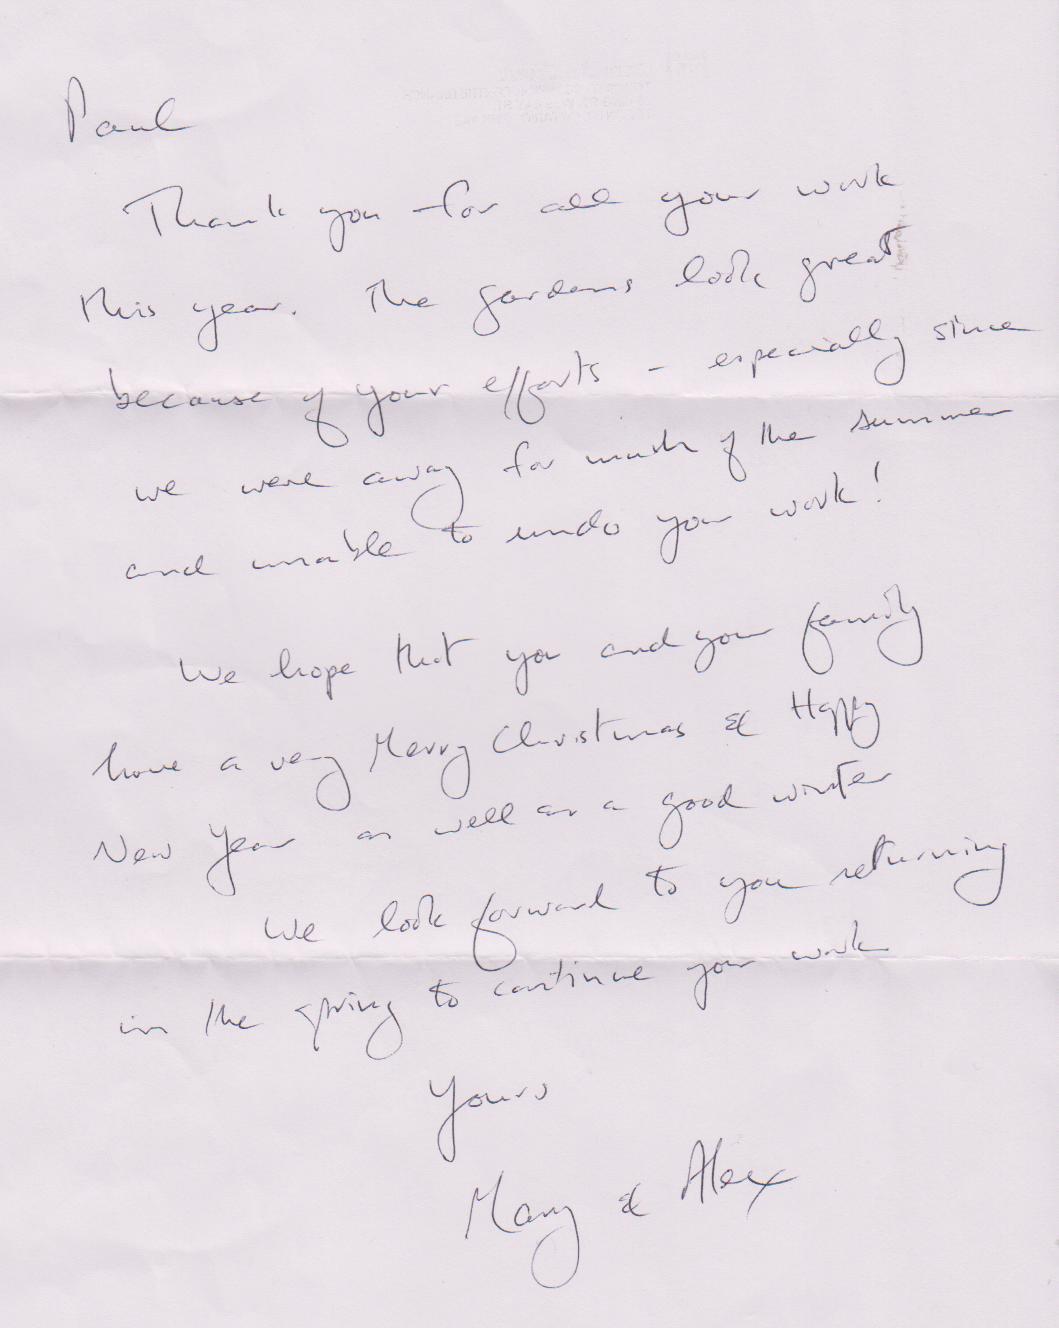 Paul Jung Gardening Services testimonial from Alex Norton, Toronto, December 2011